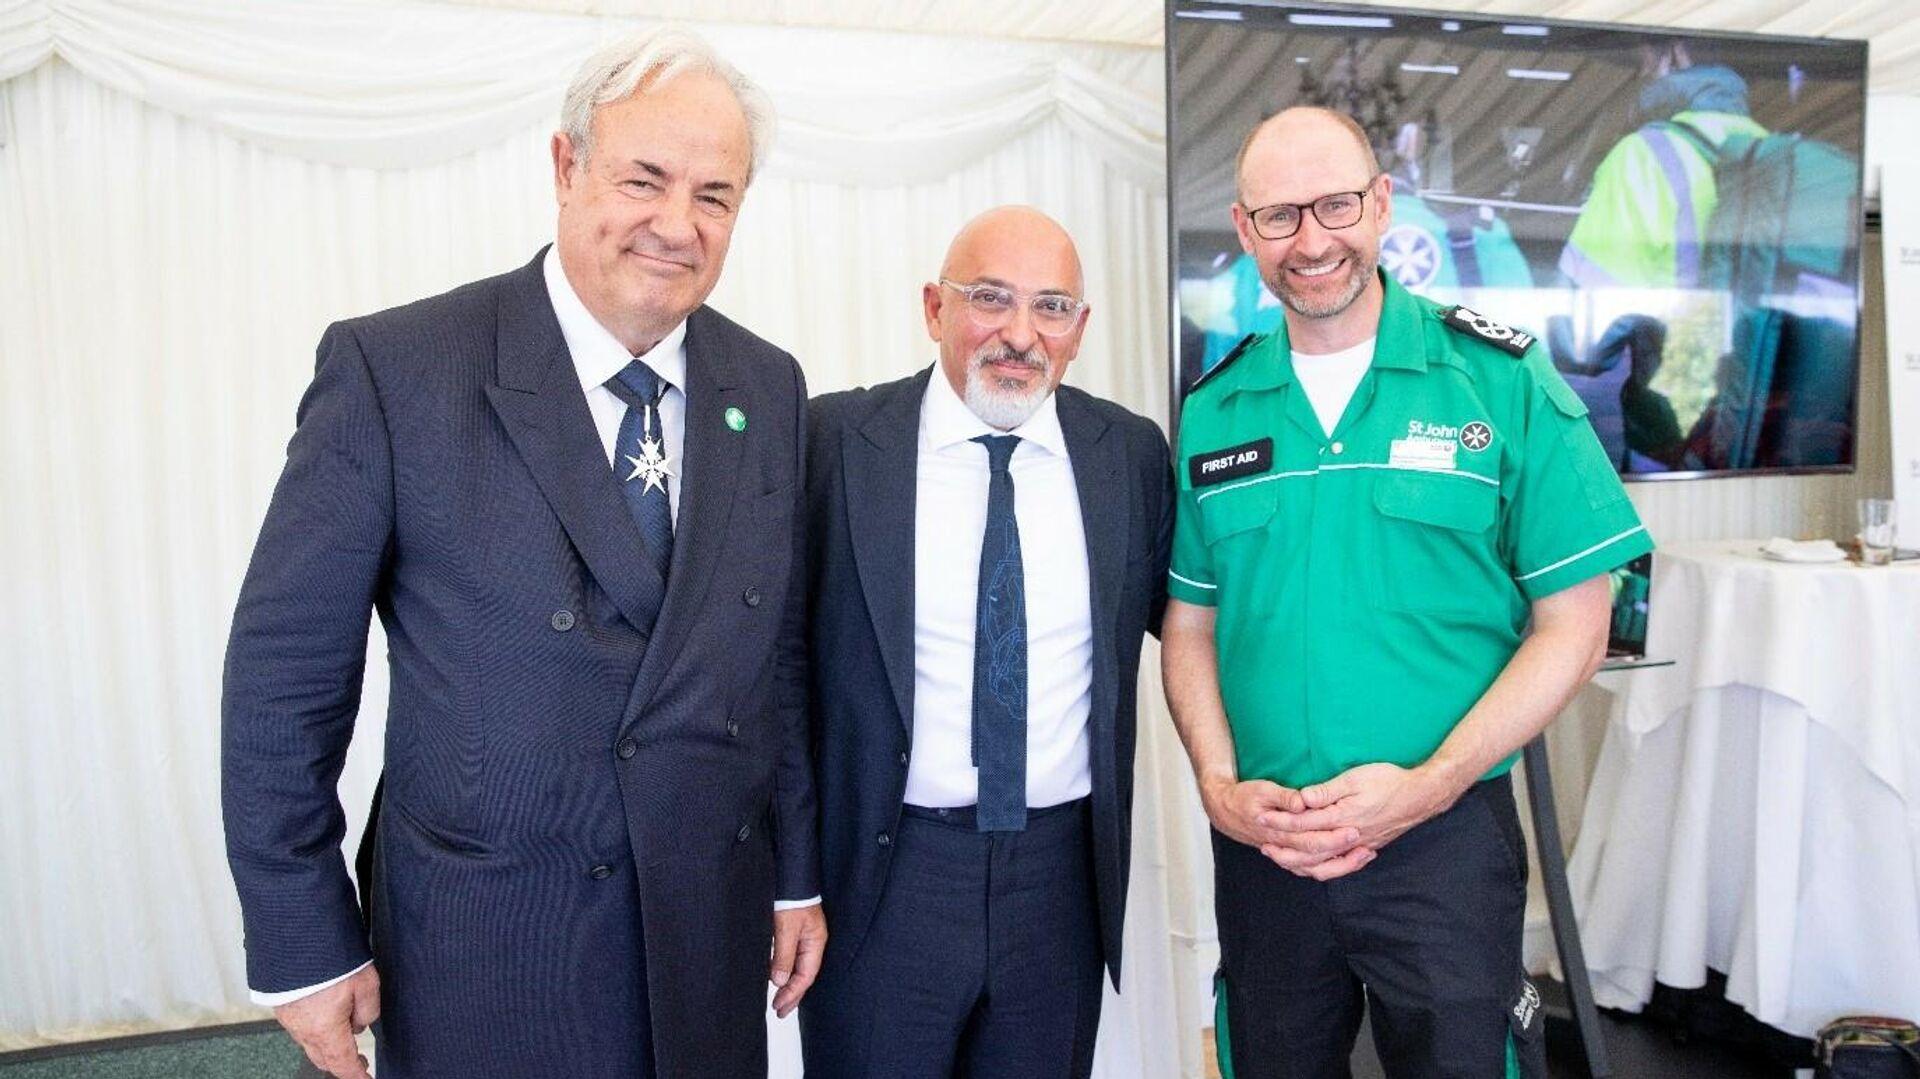 Tory MP James Gray, Nadhim Zahawi and SJA chief exec Martin Houghton-Brown at the event - Sputnik International, 1920, 12.10.2021